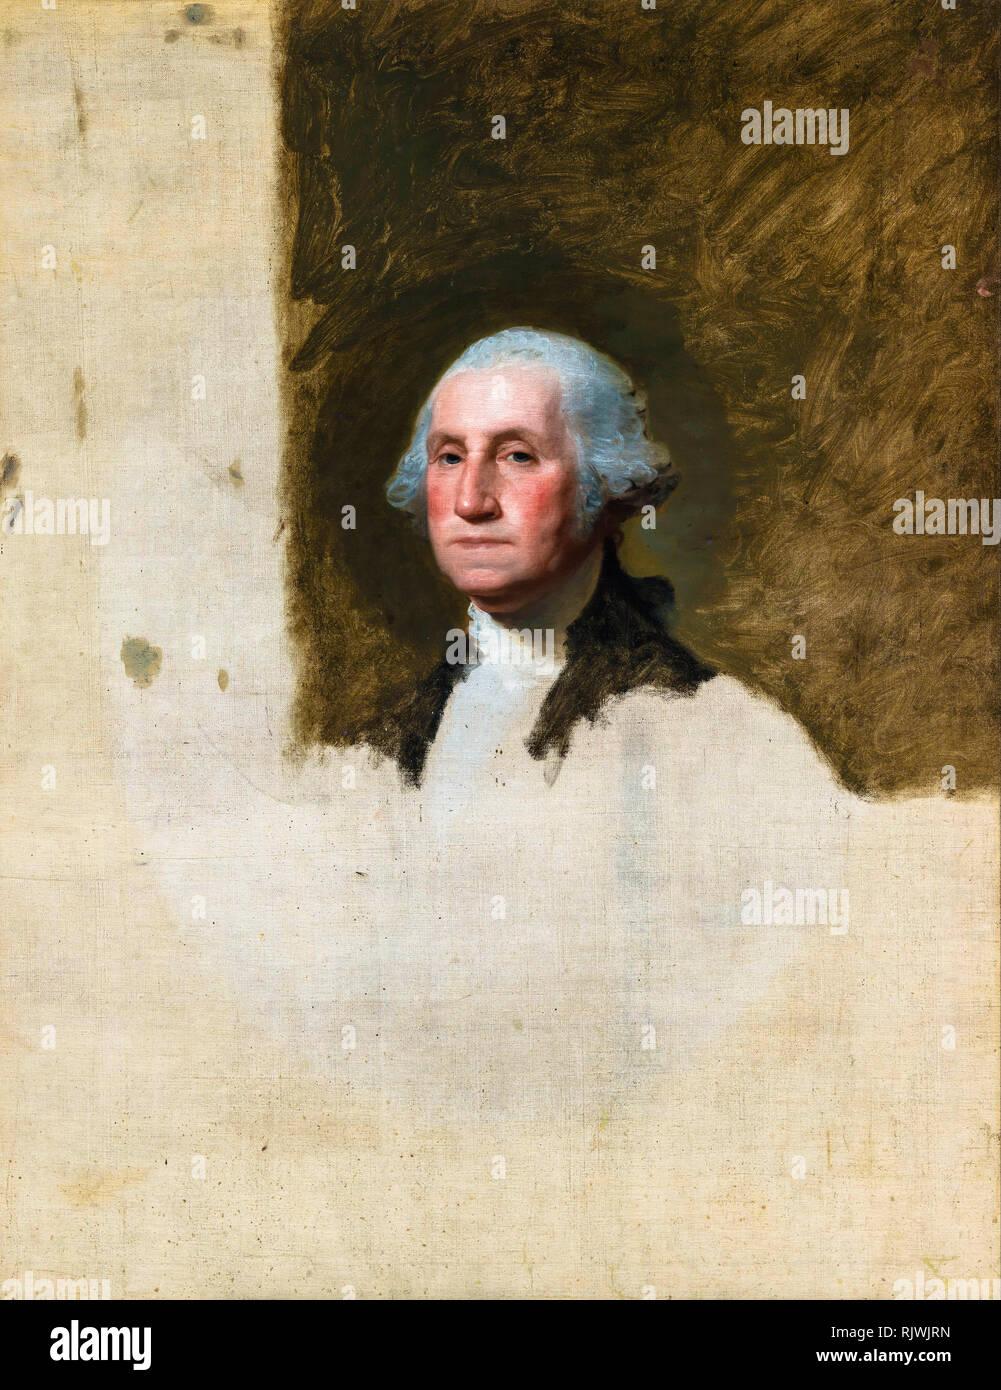 George Washington (The Athenaeum Portrait), Gilbert Stuart, 1796 - Stock Image